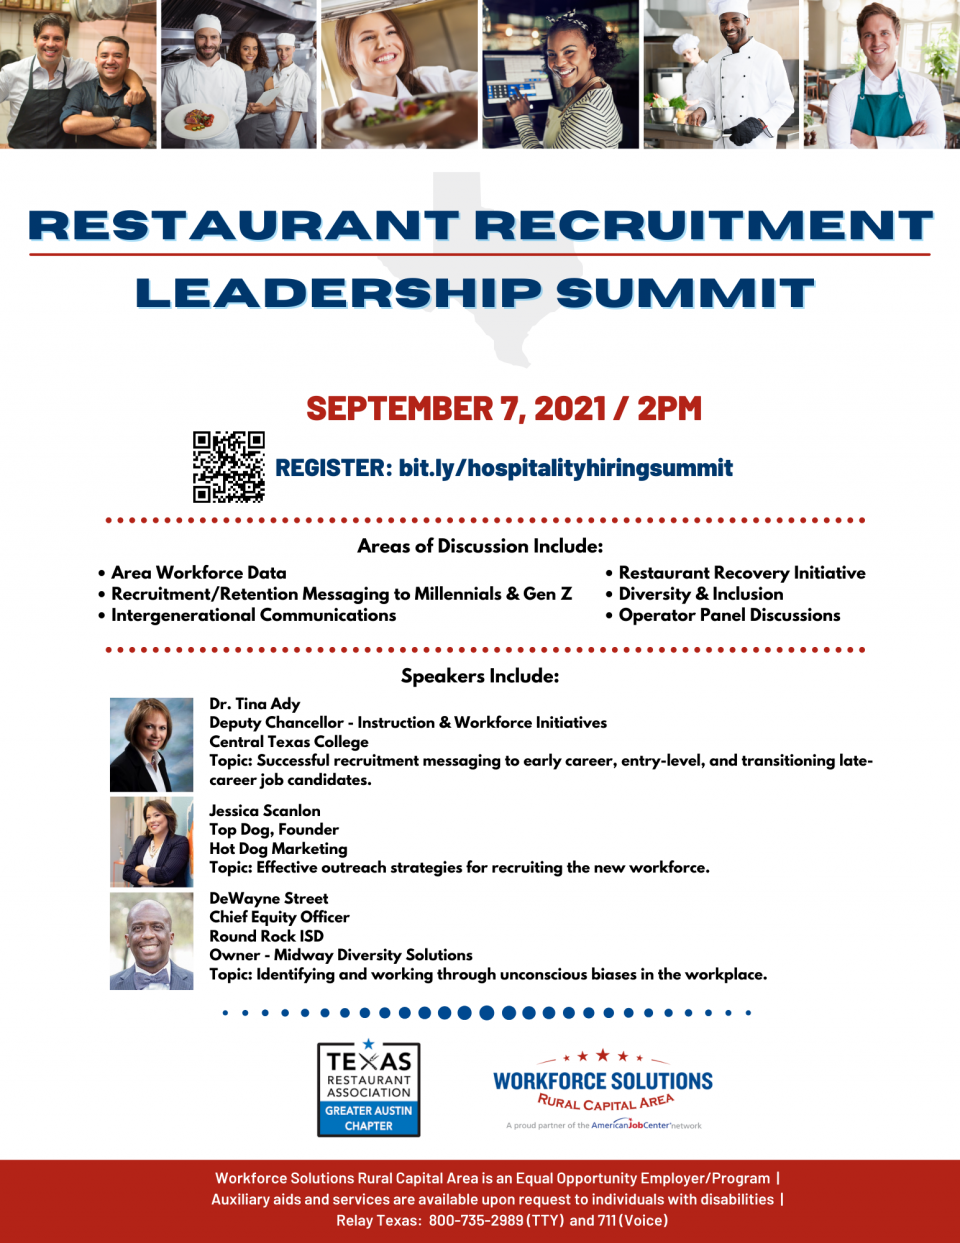 Explore Recruiting & Retention Strategies: Take Part in the Restaurant Recruitment Leadership Summit on Sept. 7